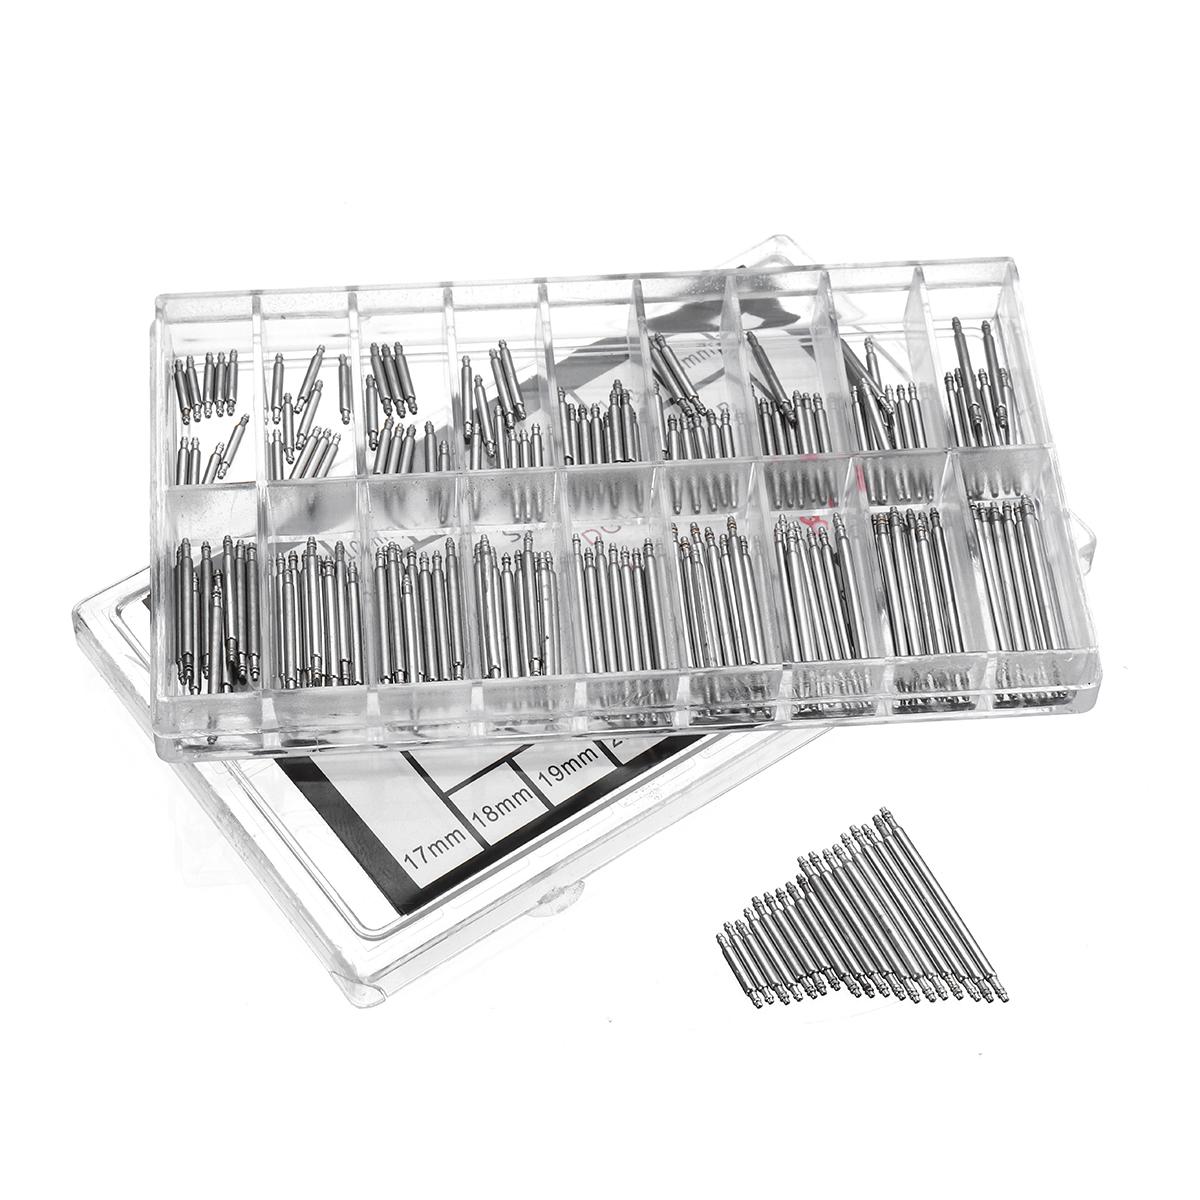 180Pcs 8-25mm Spring Bars Strap Pin Repair Fix Kit for